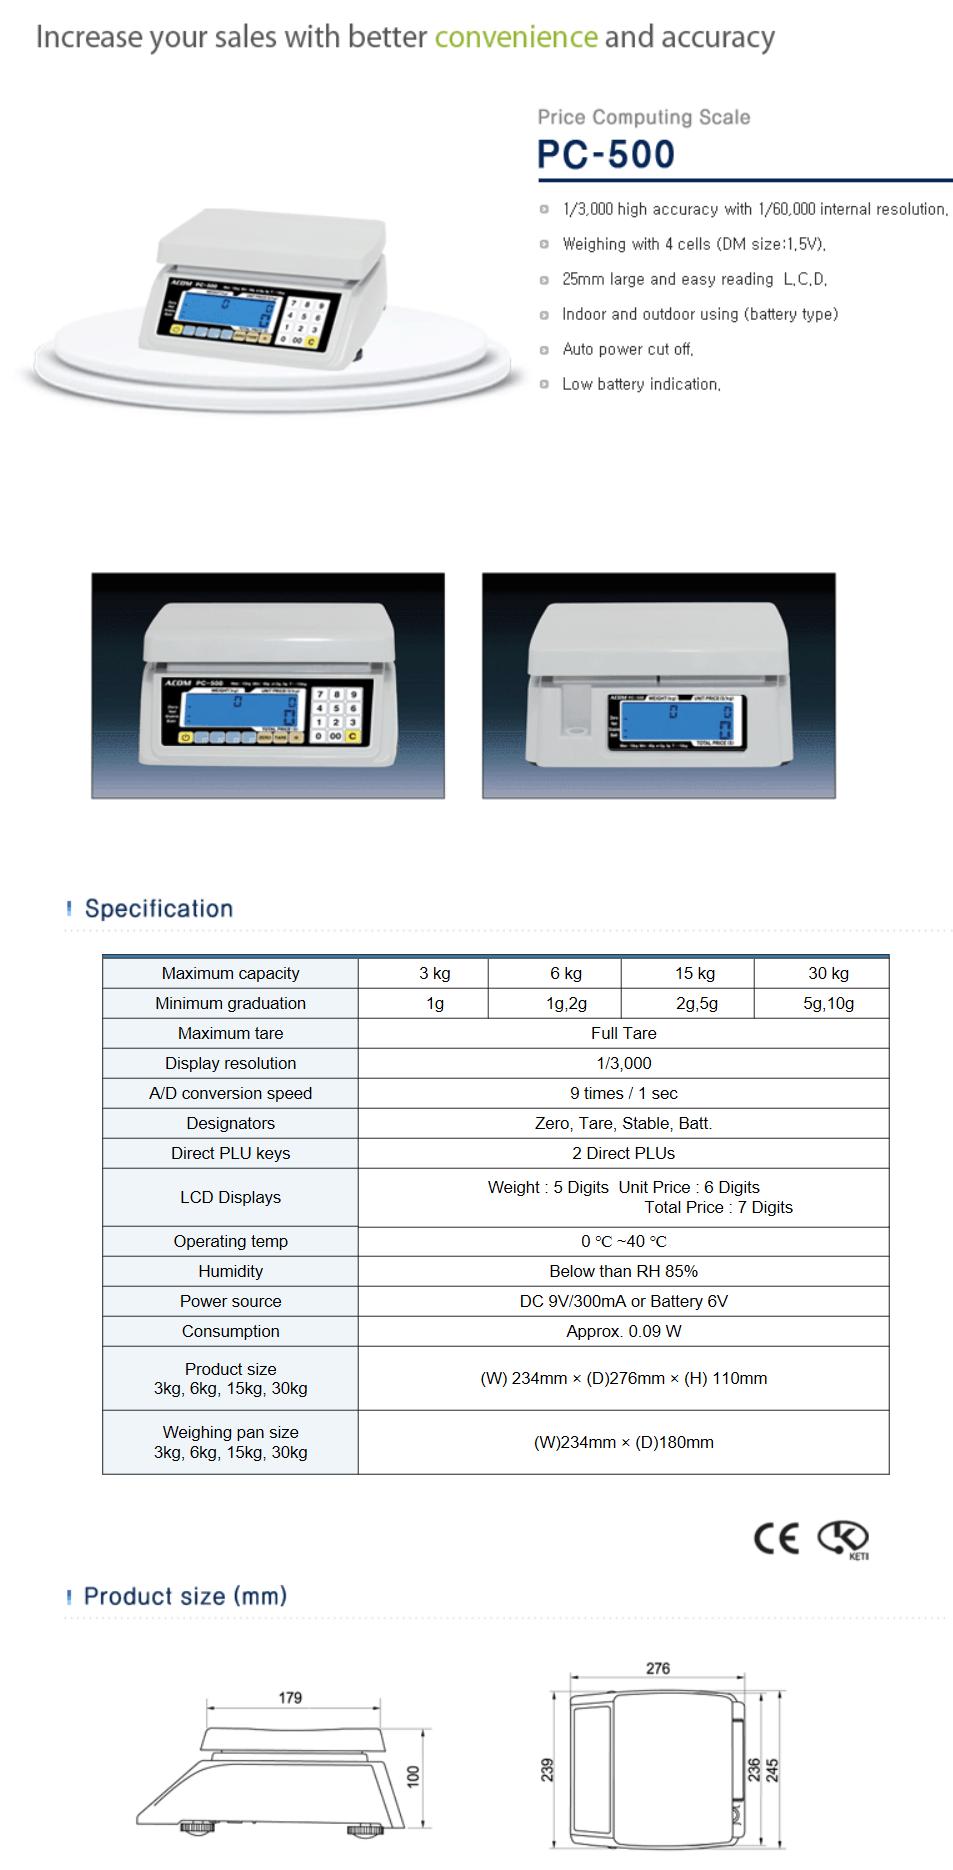 ACOM Price Computing Scale PC-500